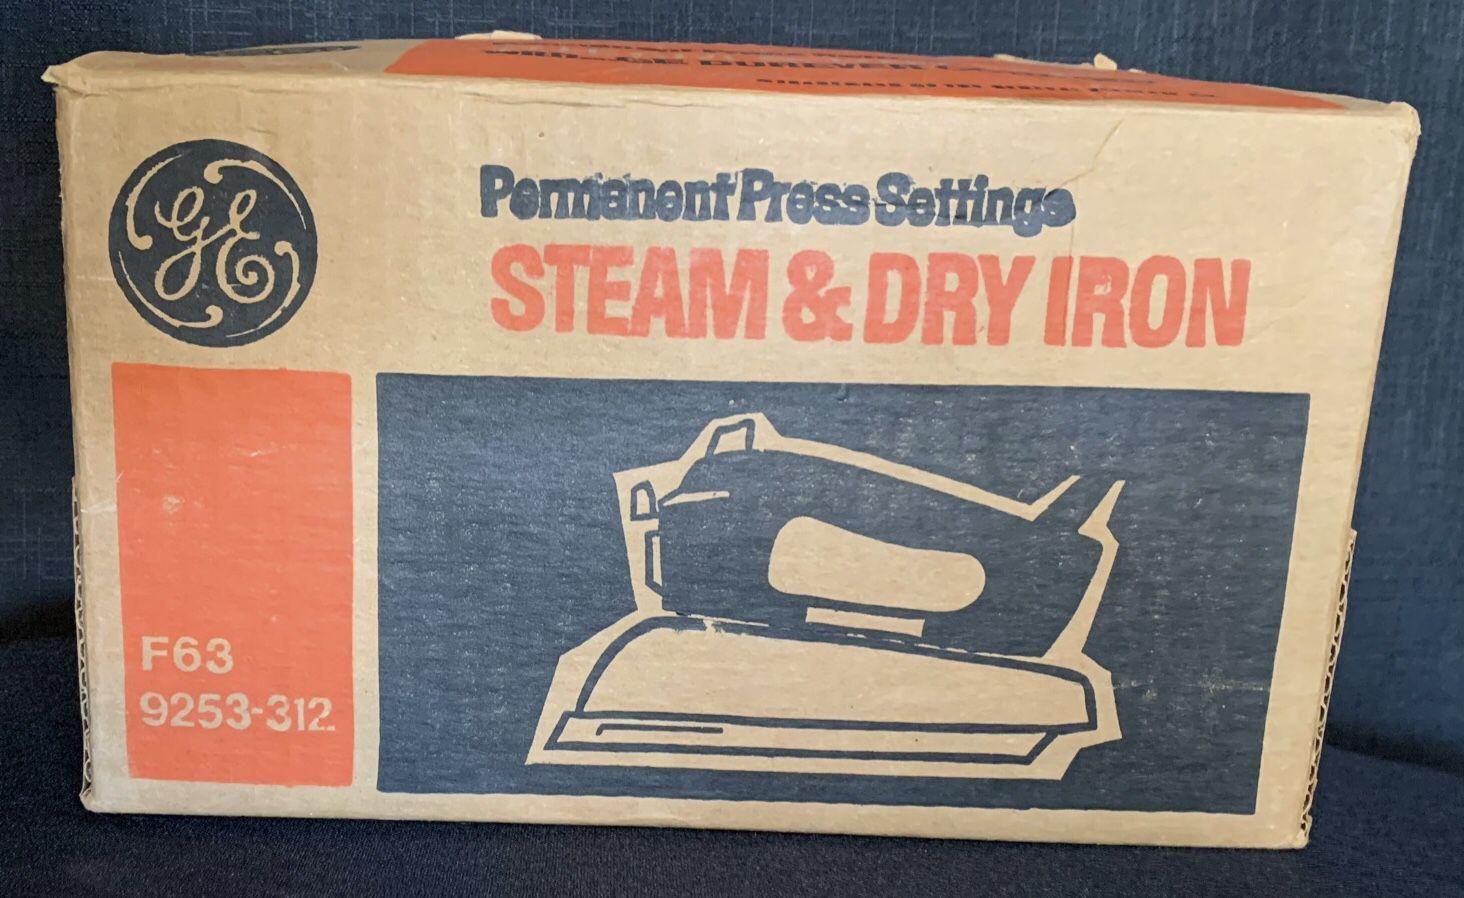 Vintage GE Permanent Press Steam & Dry Iron.